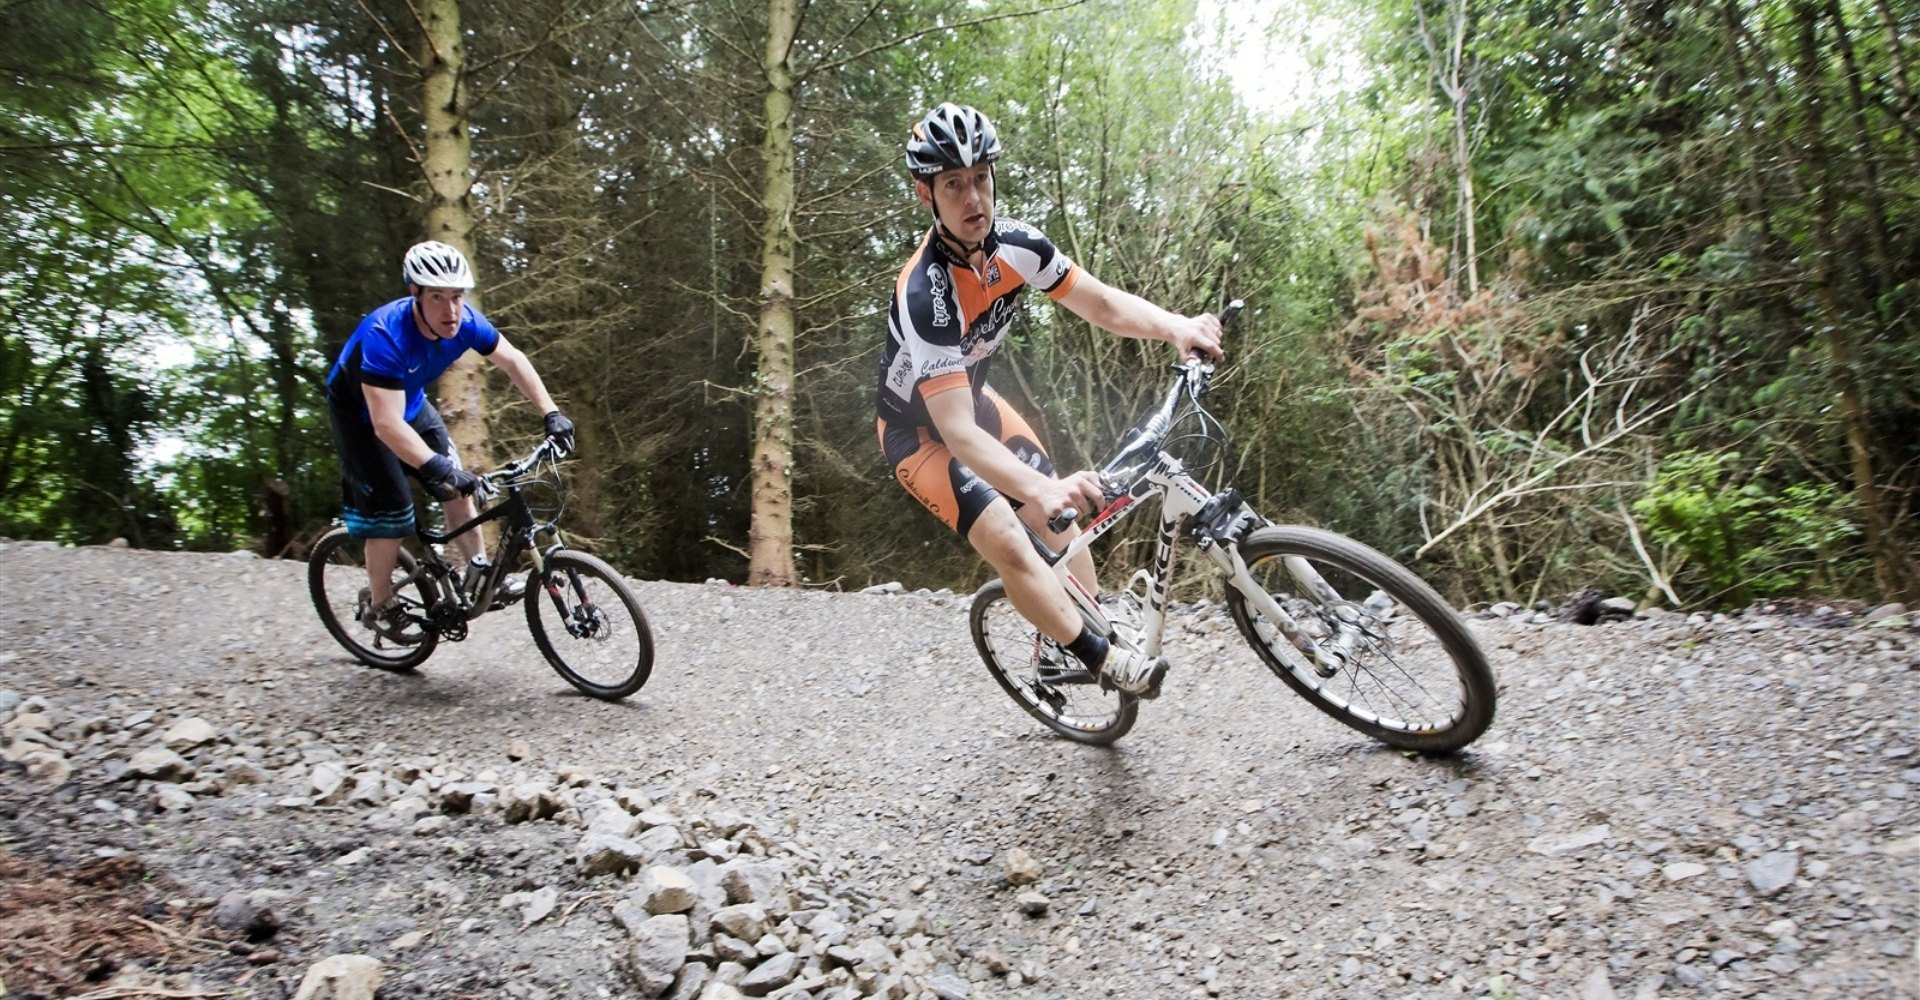 Ireland Staycation - Mountain Biking